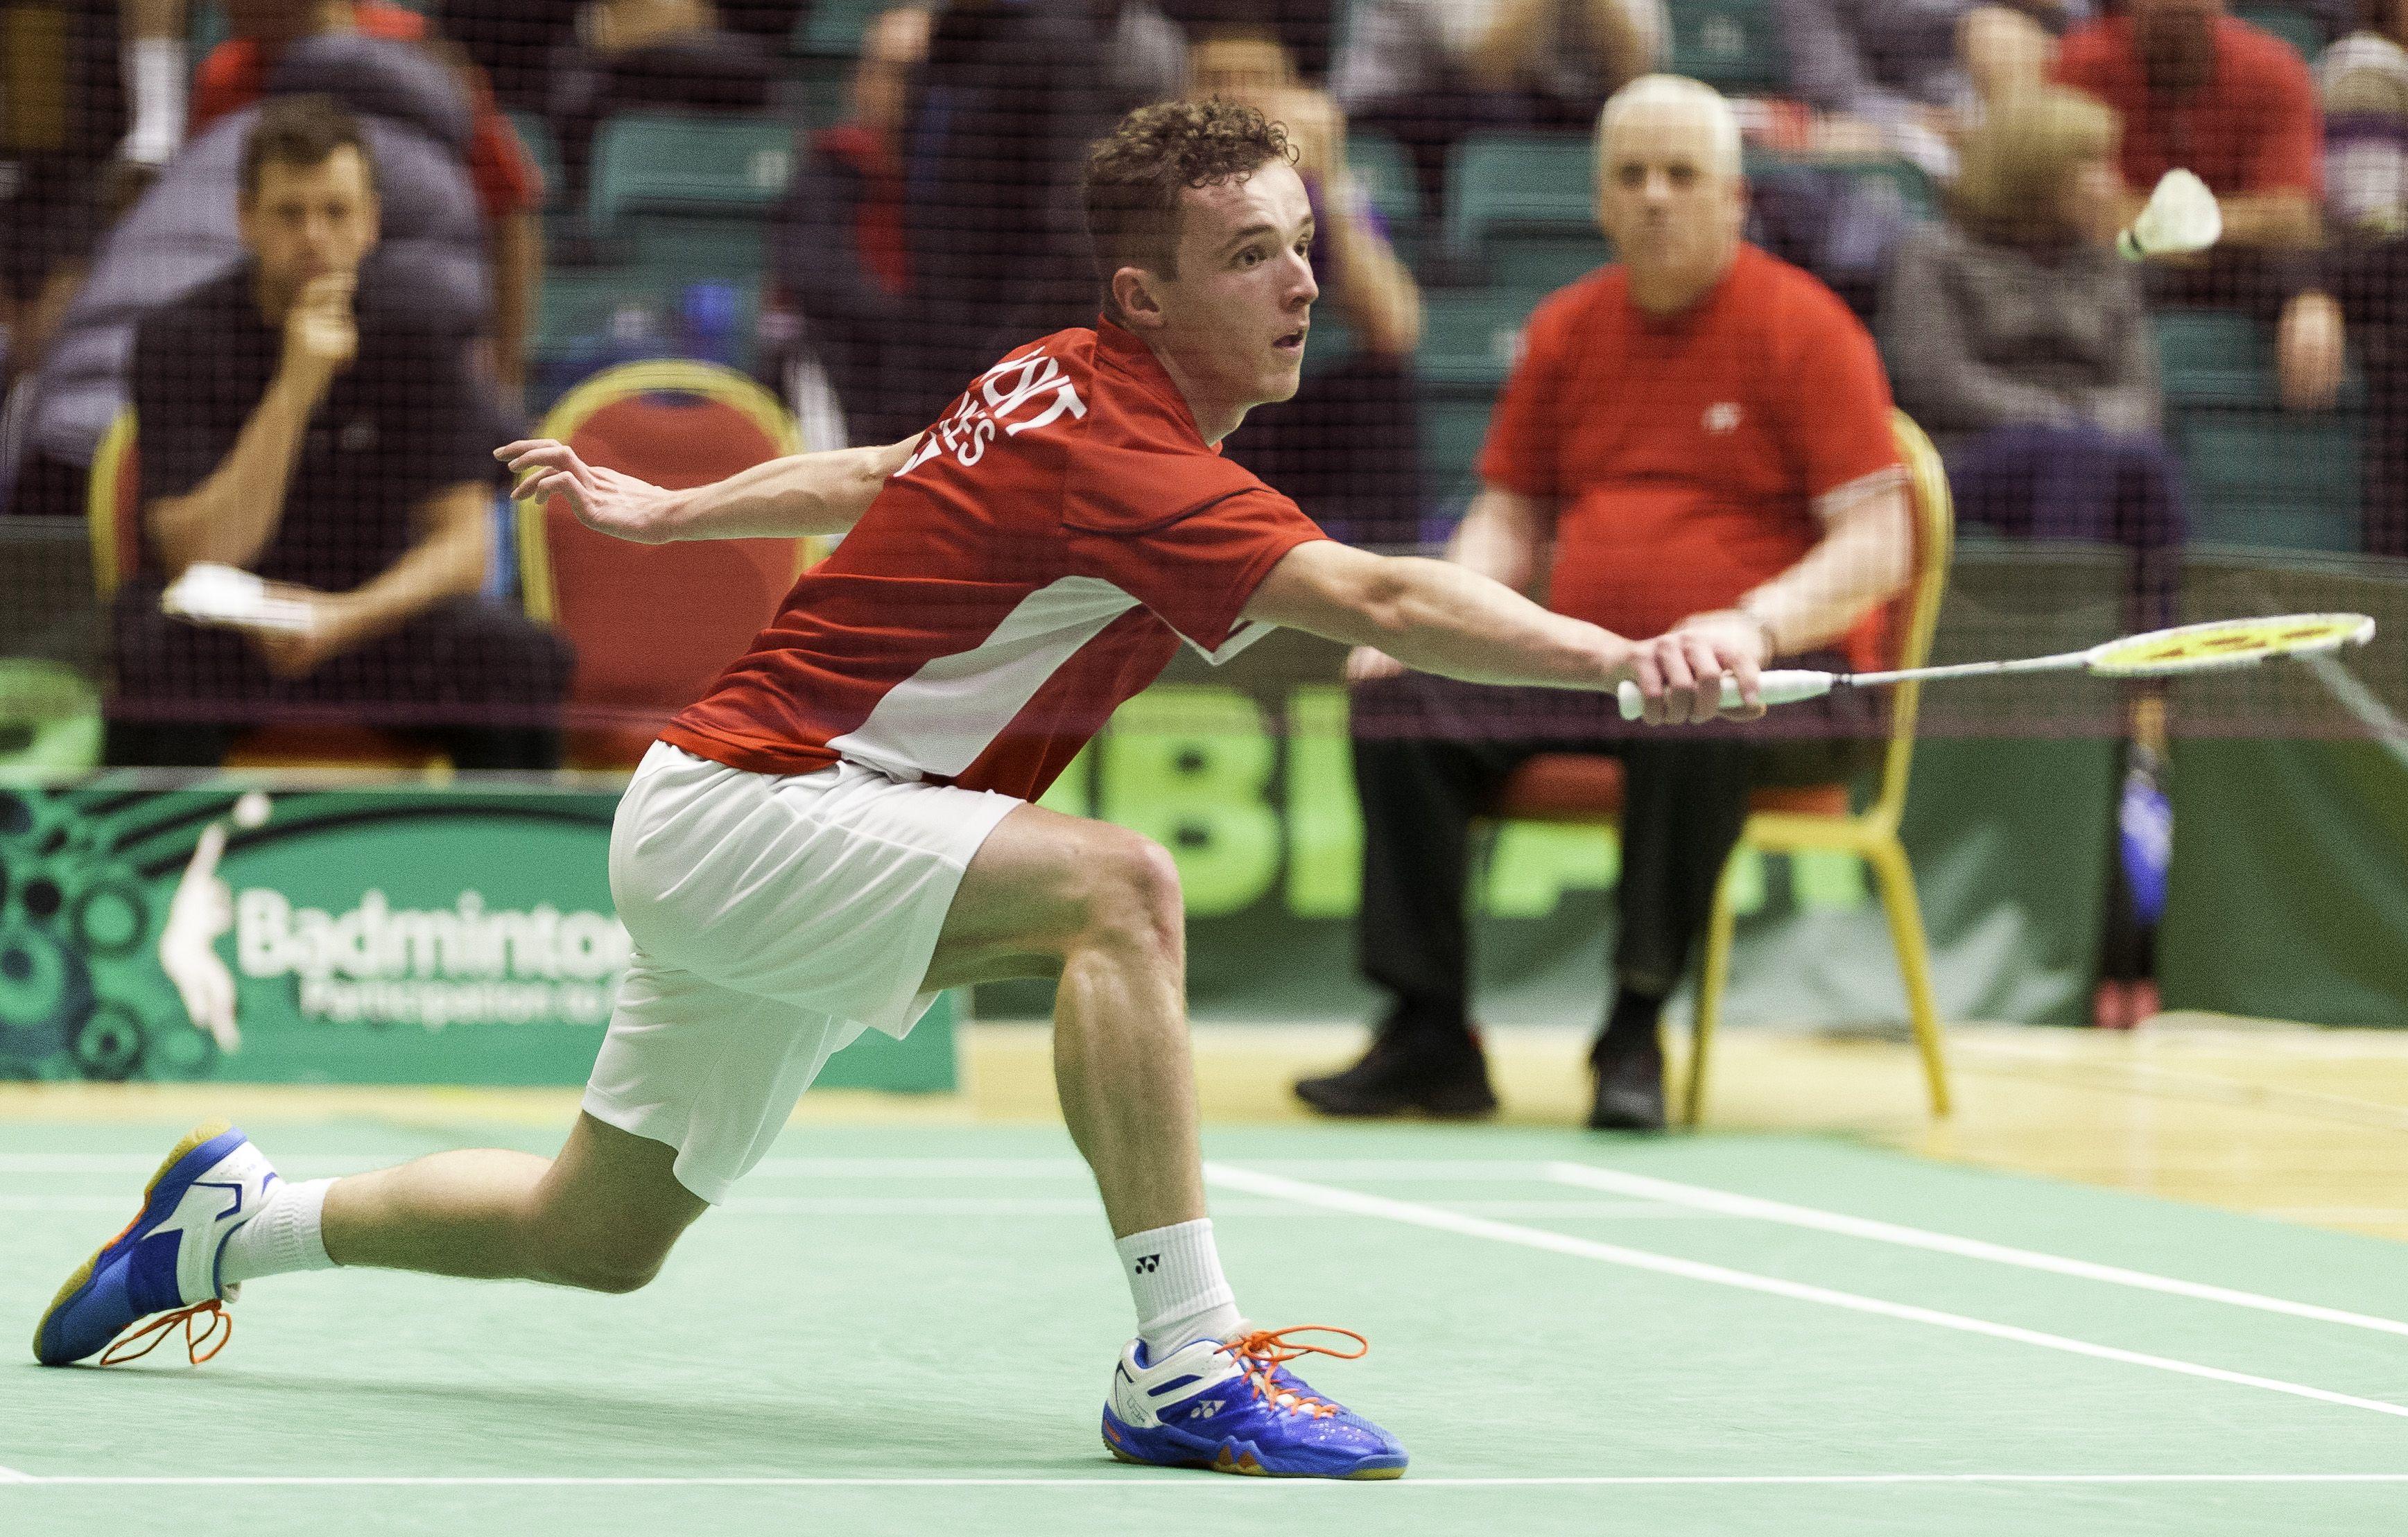 Badminton wales badminton wales sports